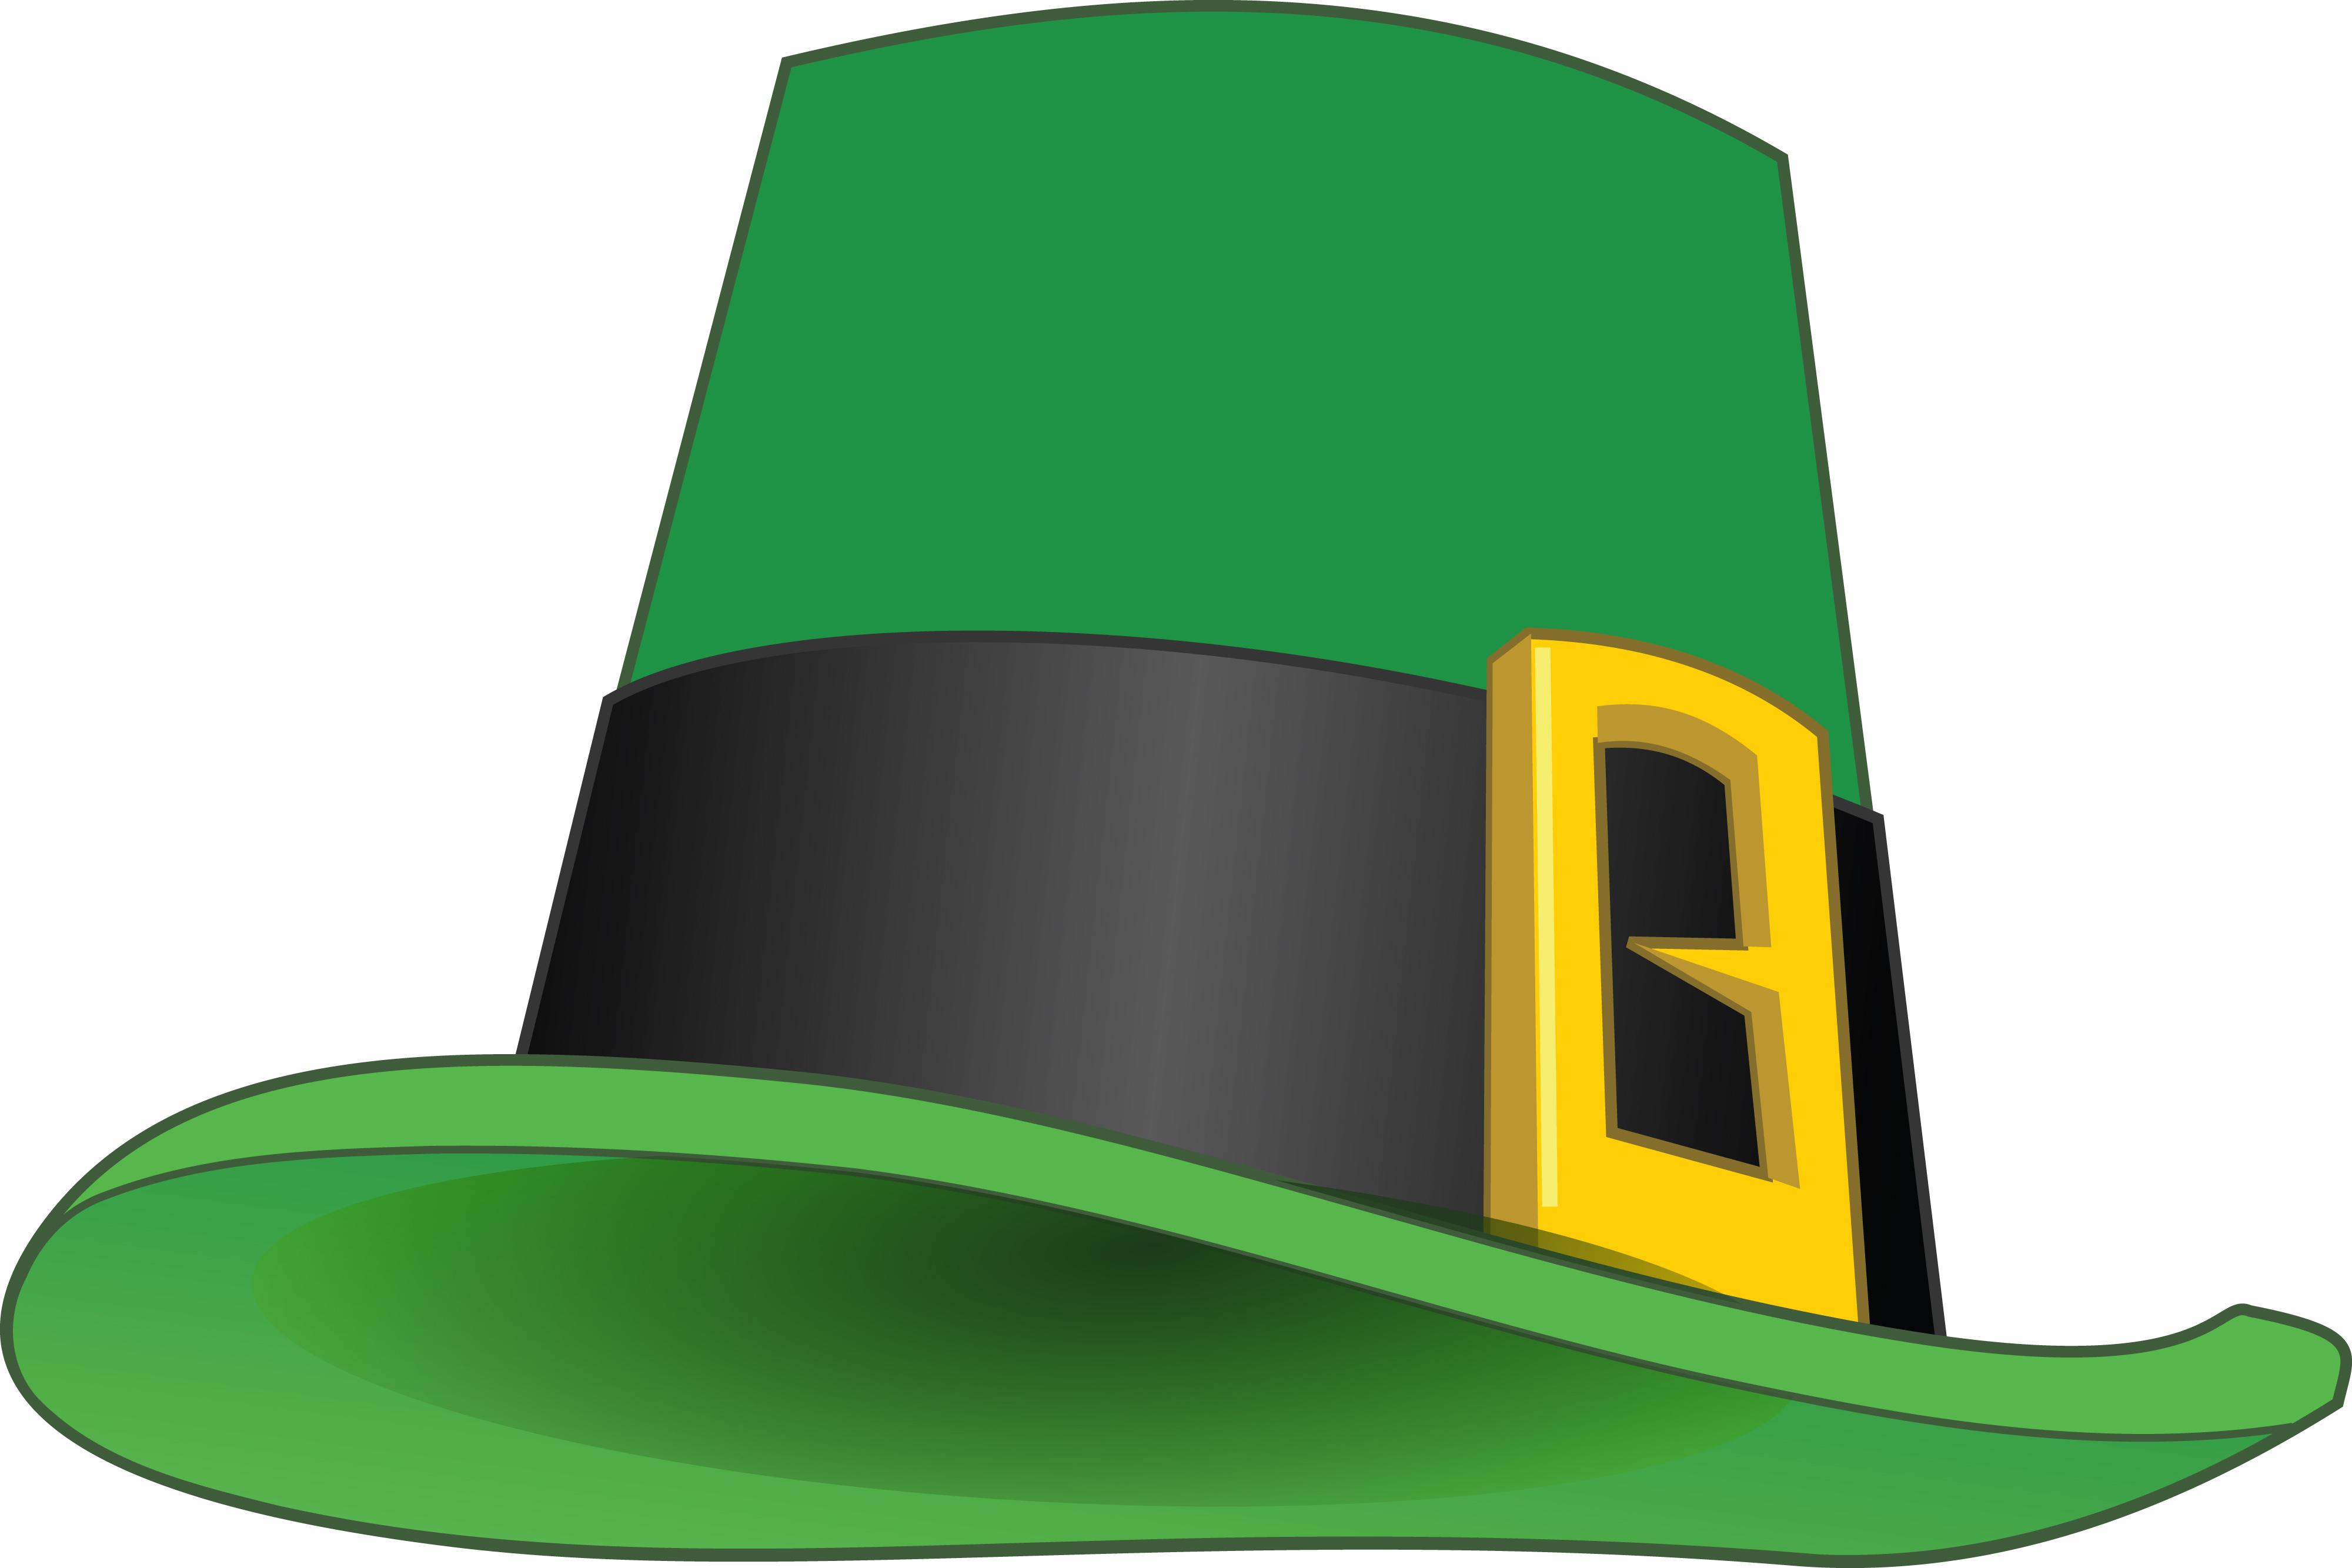 4000x2667 Clipart Of A St Patricks Day Leprechaun Hat